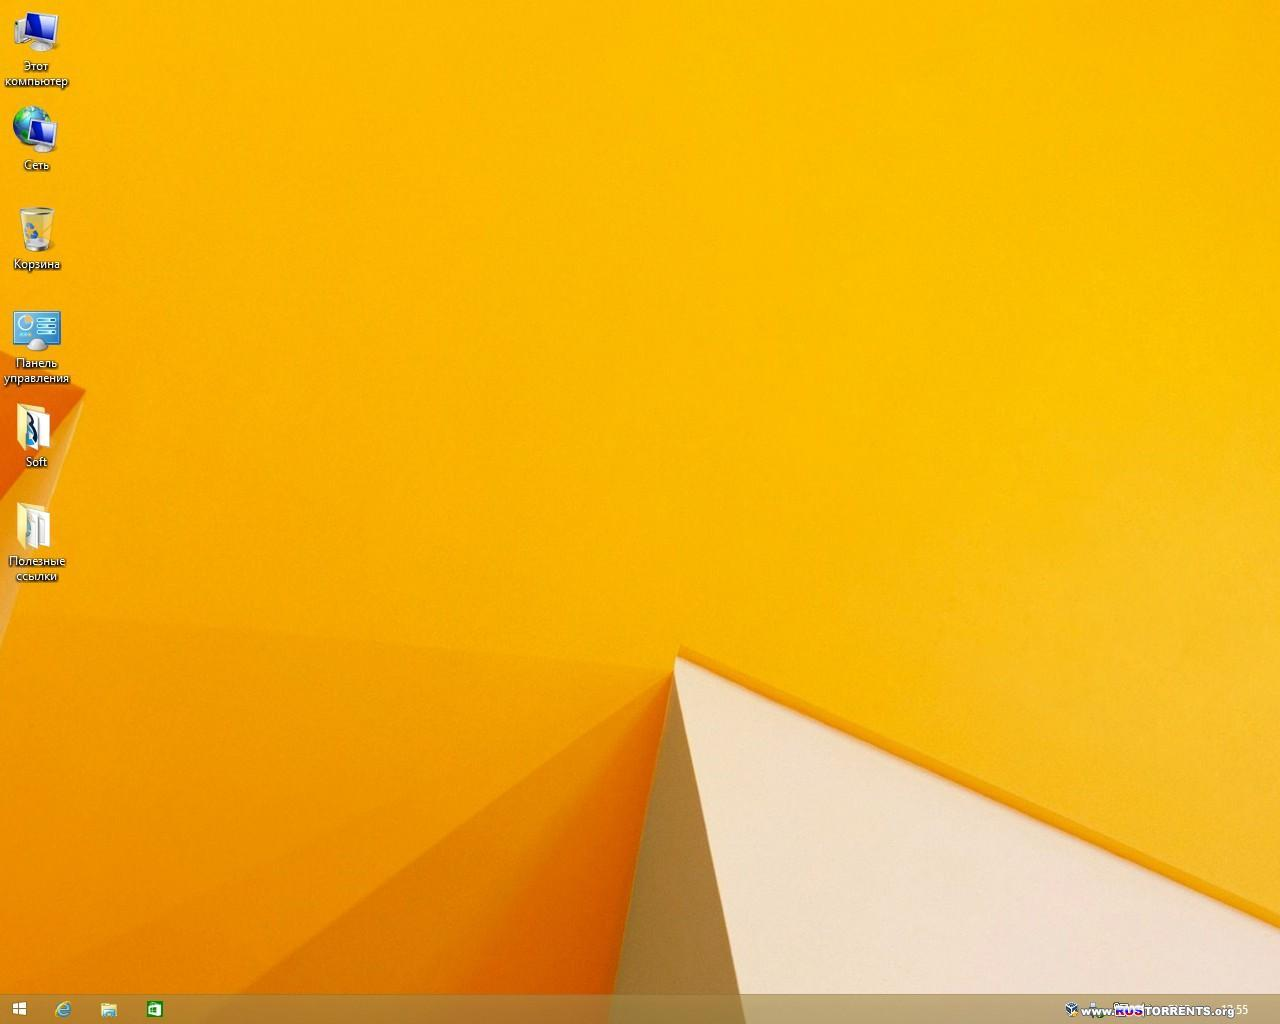 Windows 8.1 Professional VL х86/х64 by sibiryak v.20.09 RUS